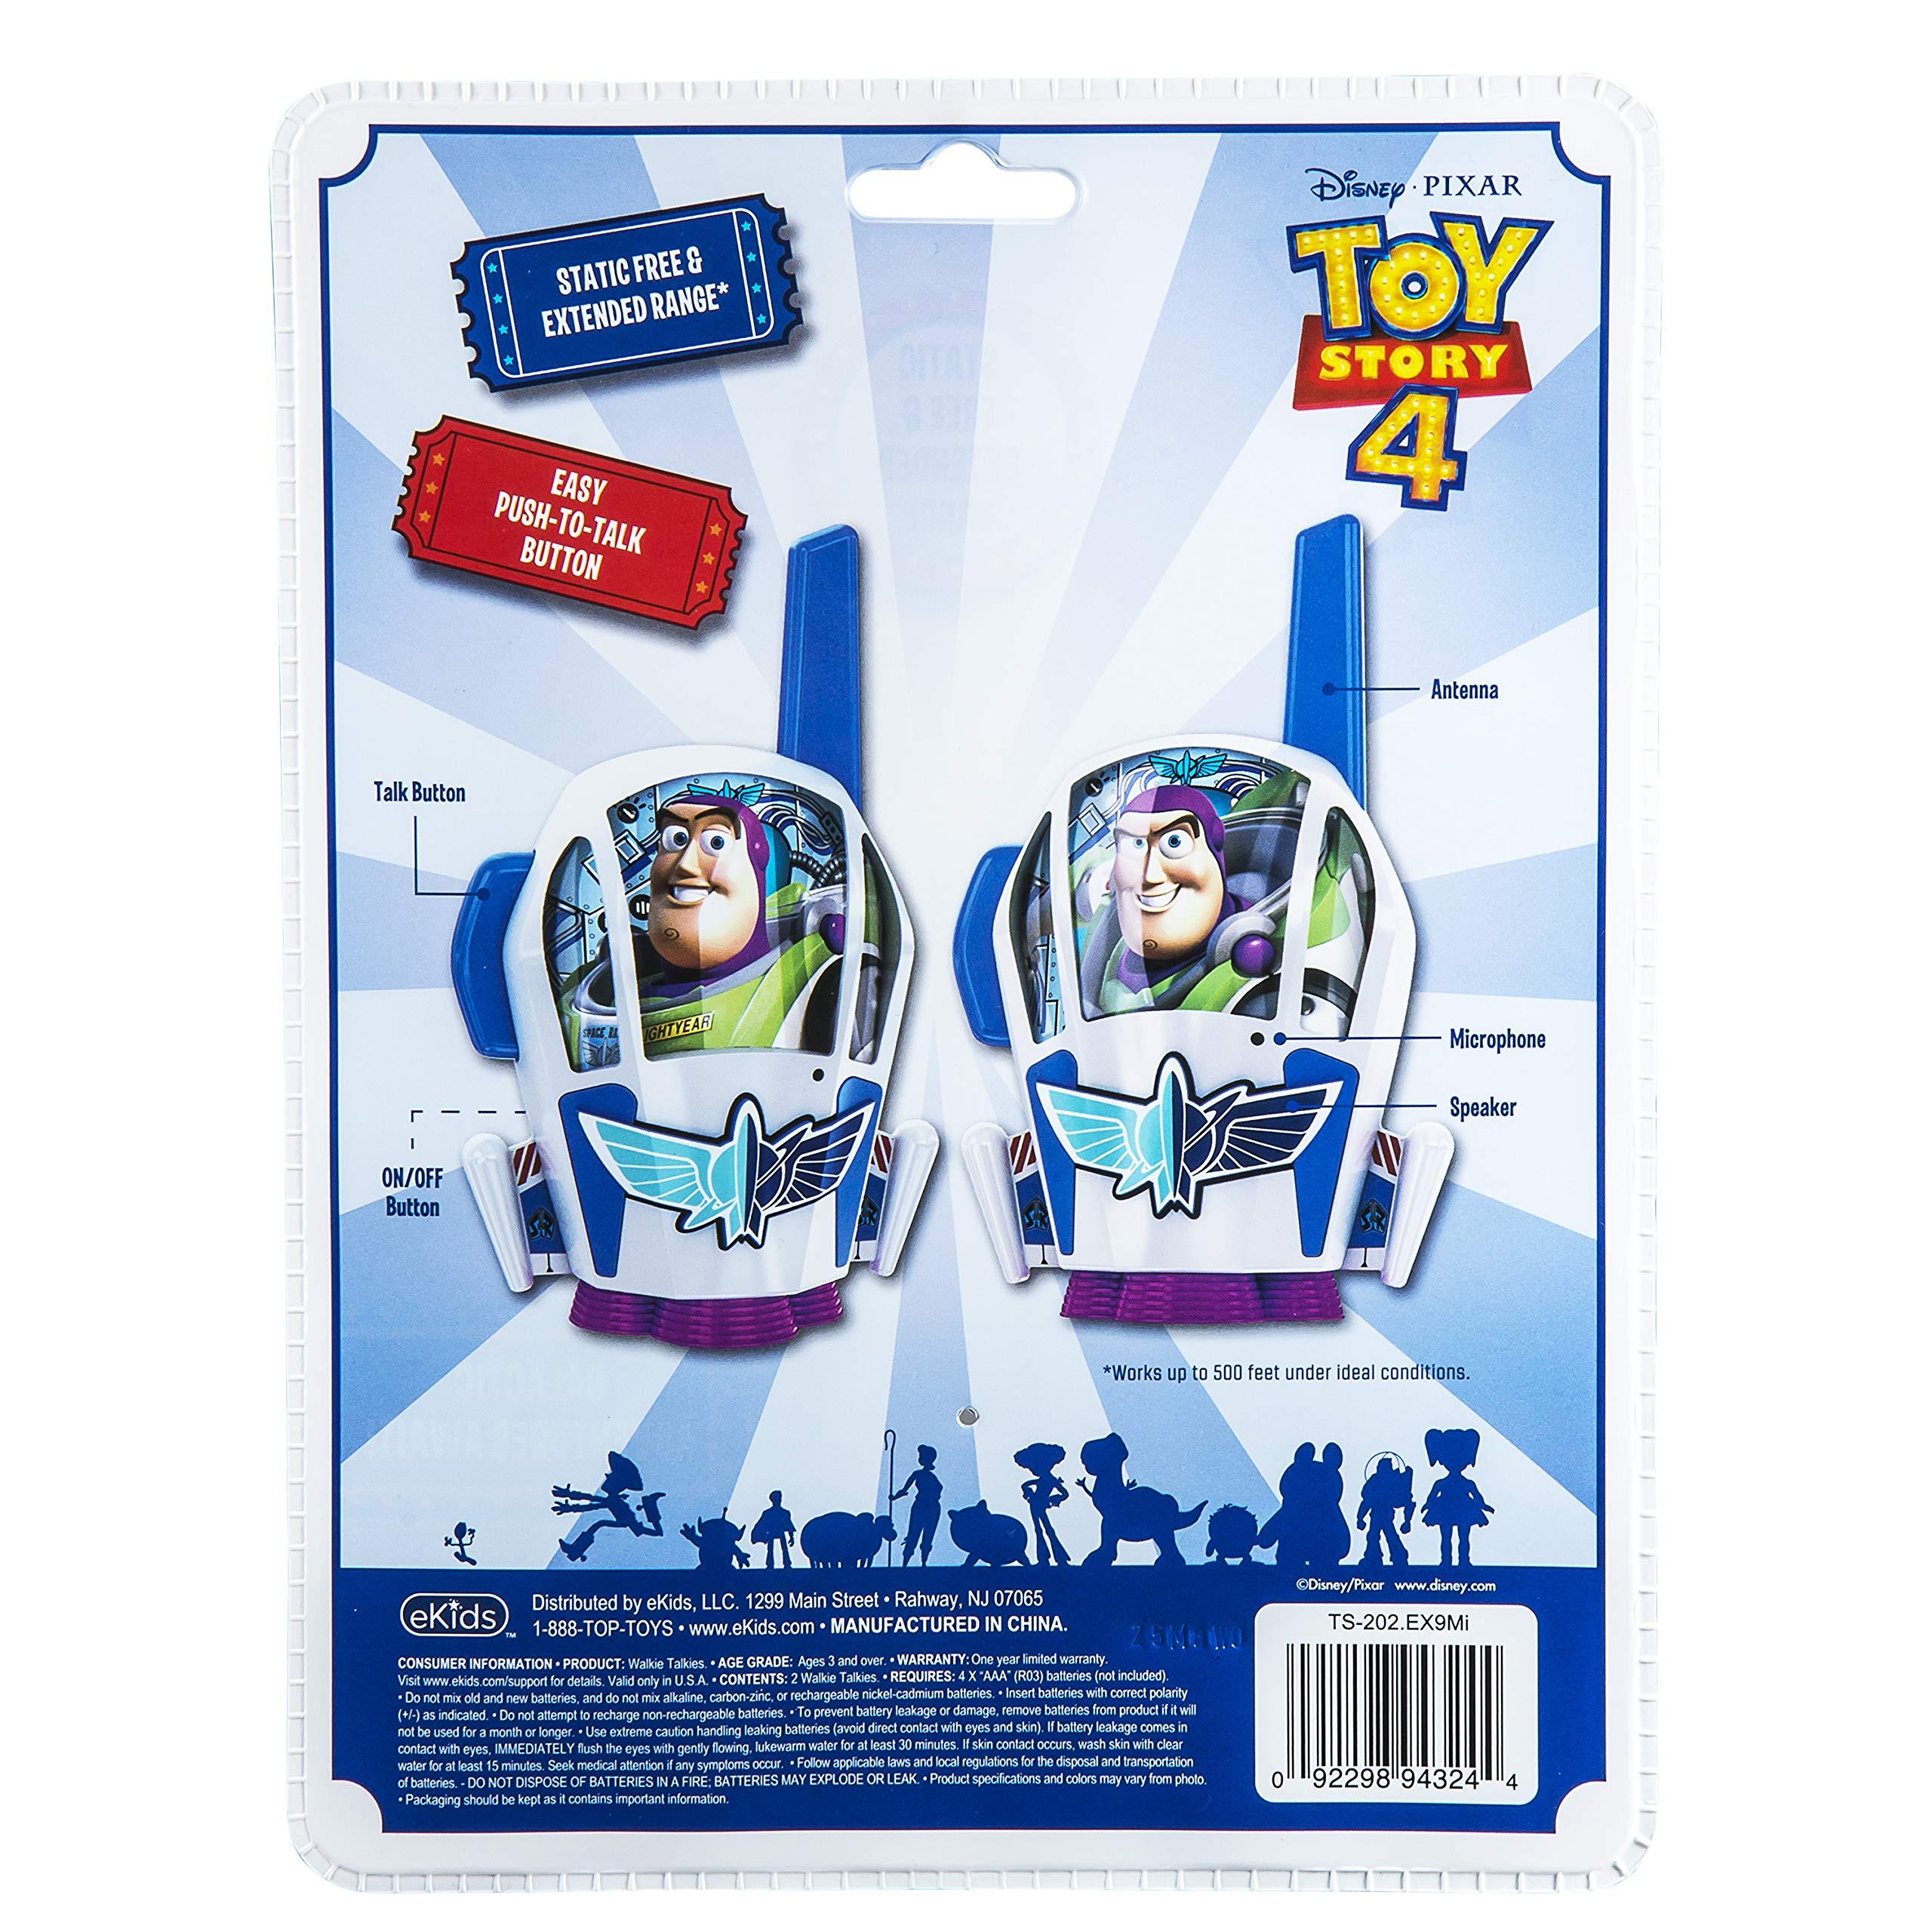 Toy Story 4 Buzz Lightyear Kids Walkie Talkies for Kids Static Free Extended Range Kid Friendly Easy to Use 2 Way Radio Toy Handheld Walkie Talkies Team Work Play Indoors or Outdoors by eKids (Image #5)